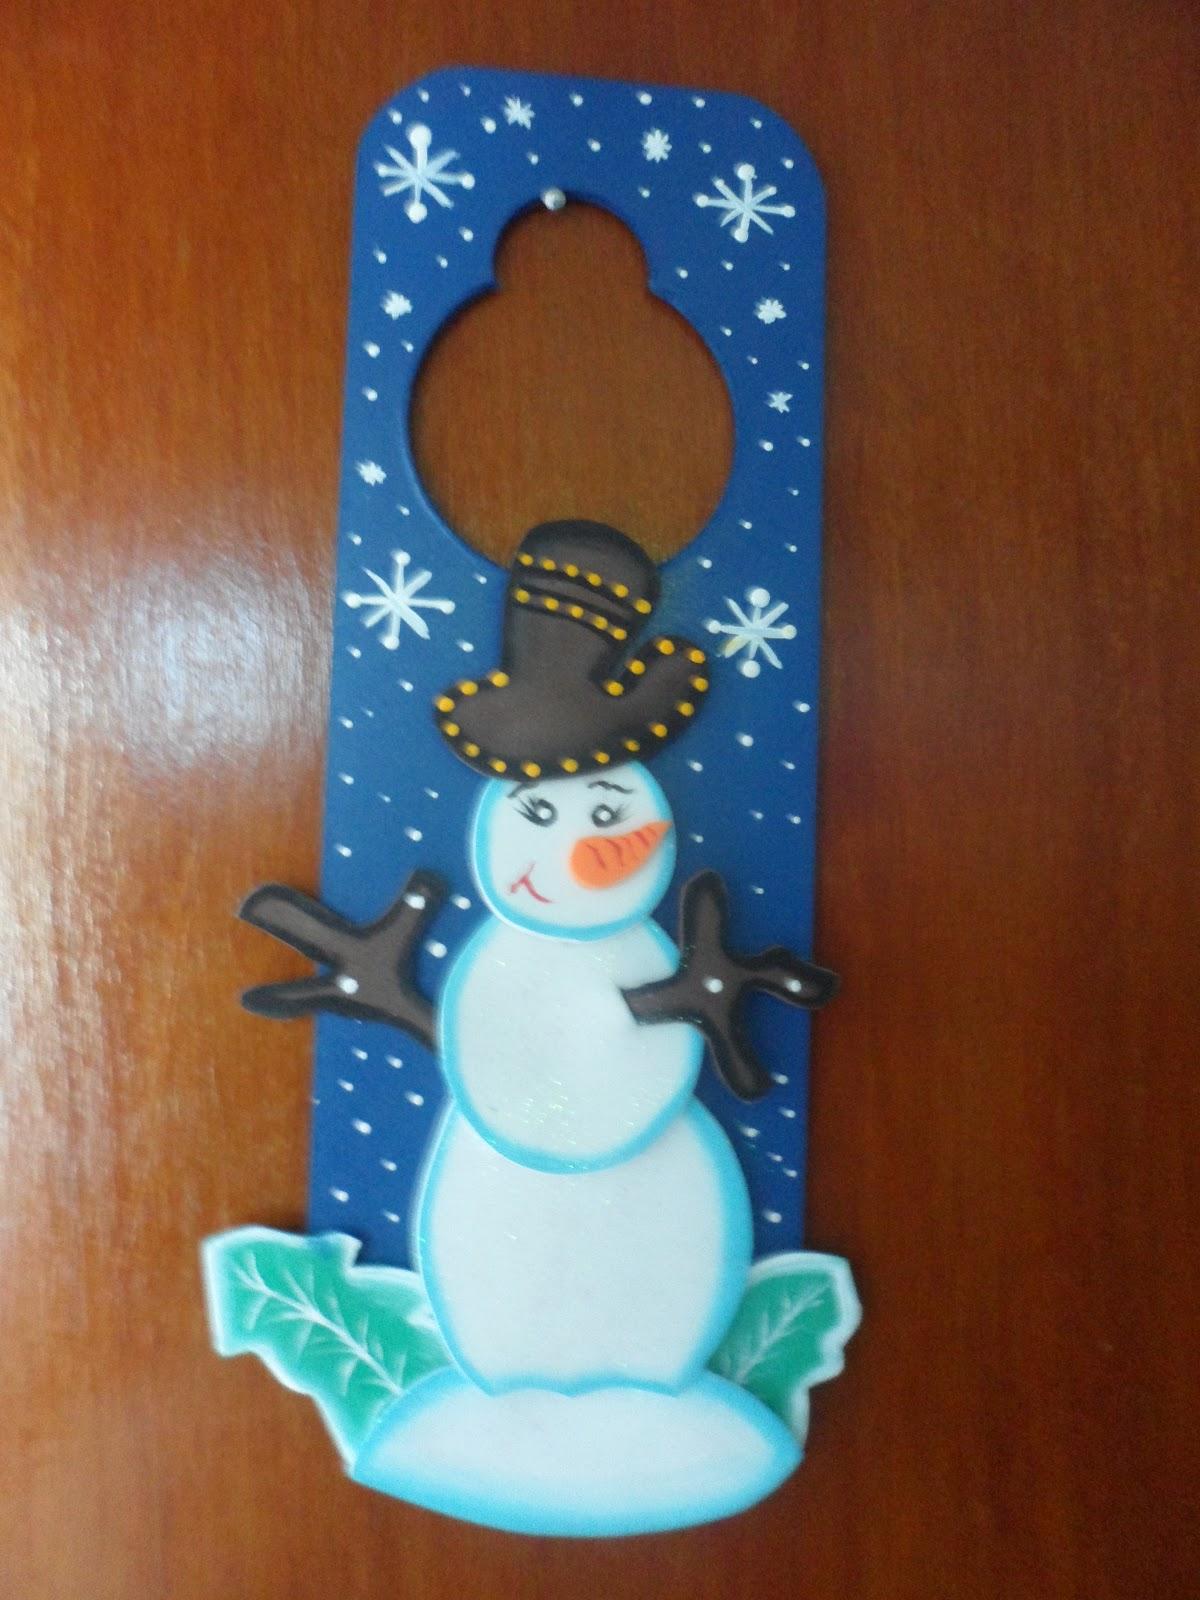 Maliju art decoraci n para navidad for Decoracion para puertas de preescolar